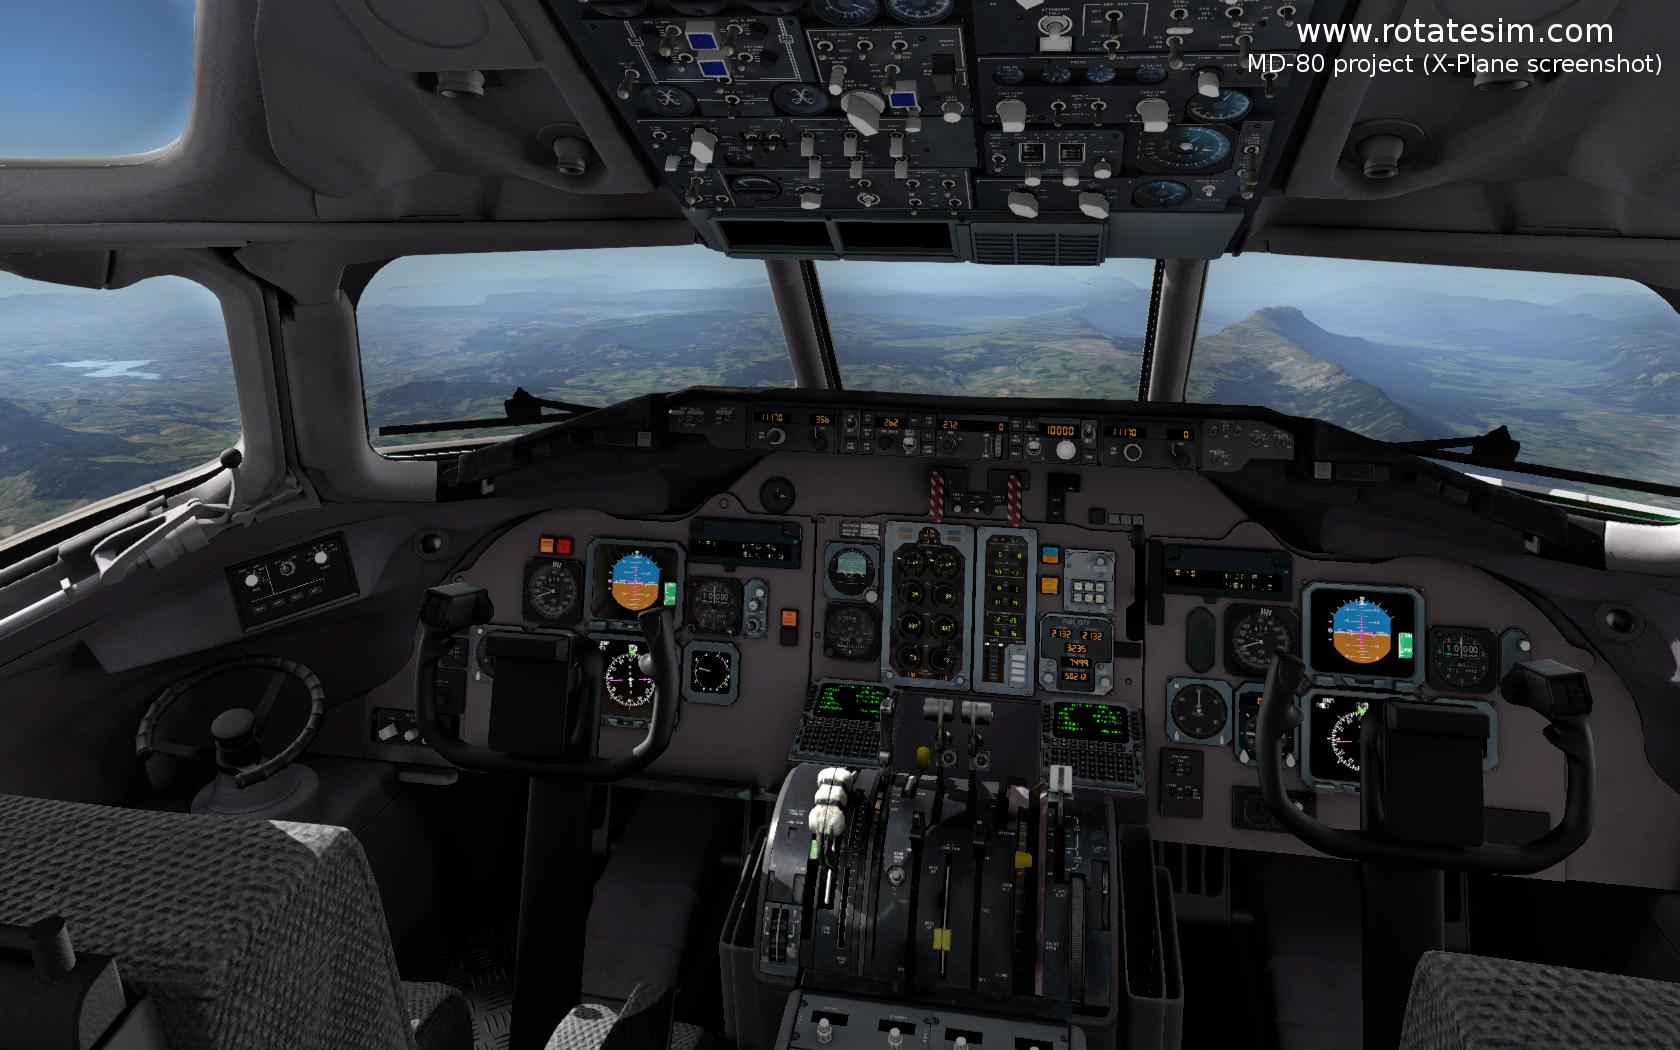 MD-80 screenshot 07